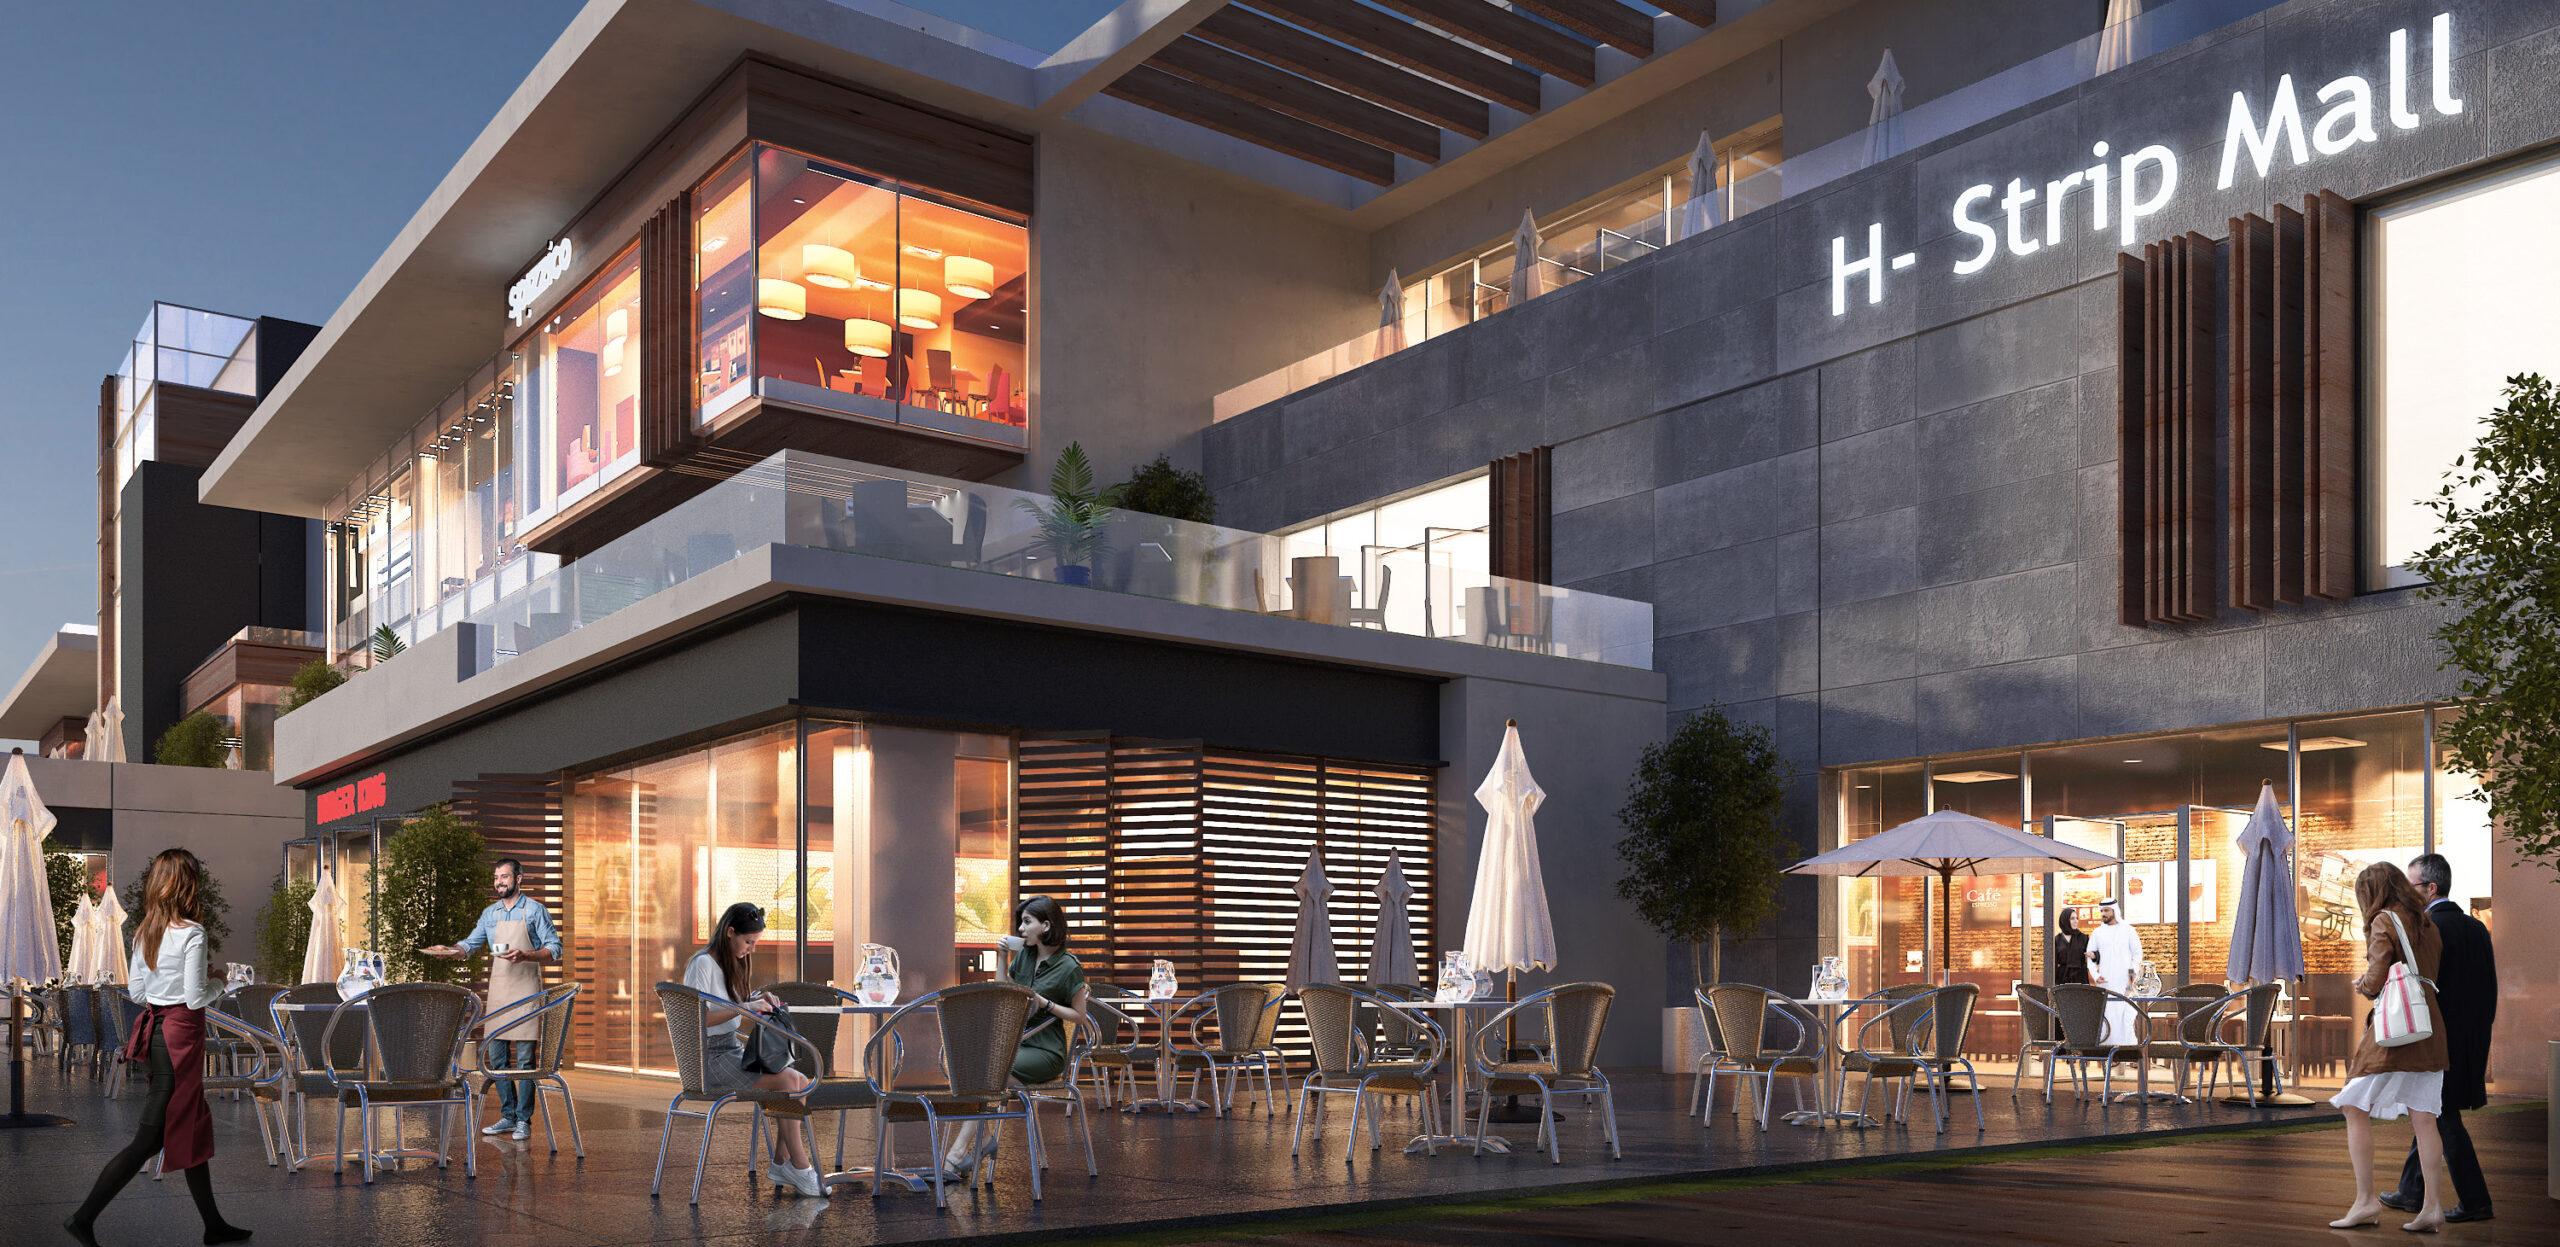 jiddah strip mall 4